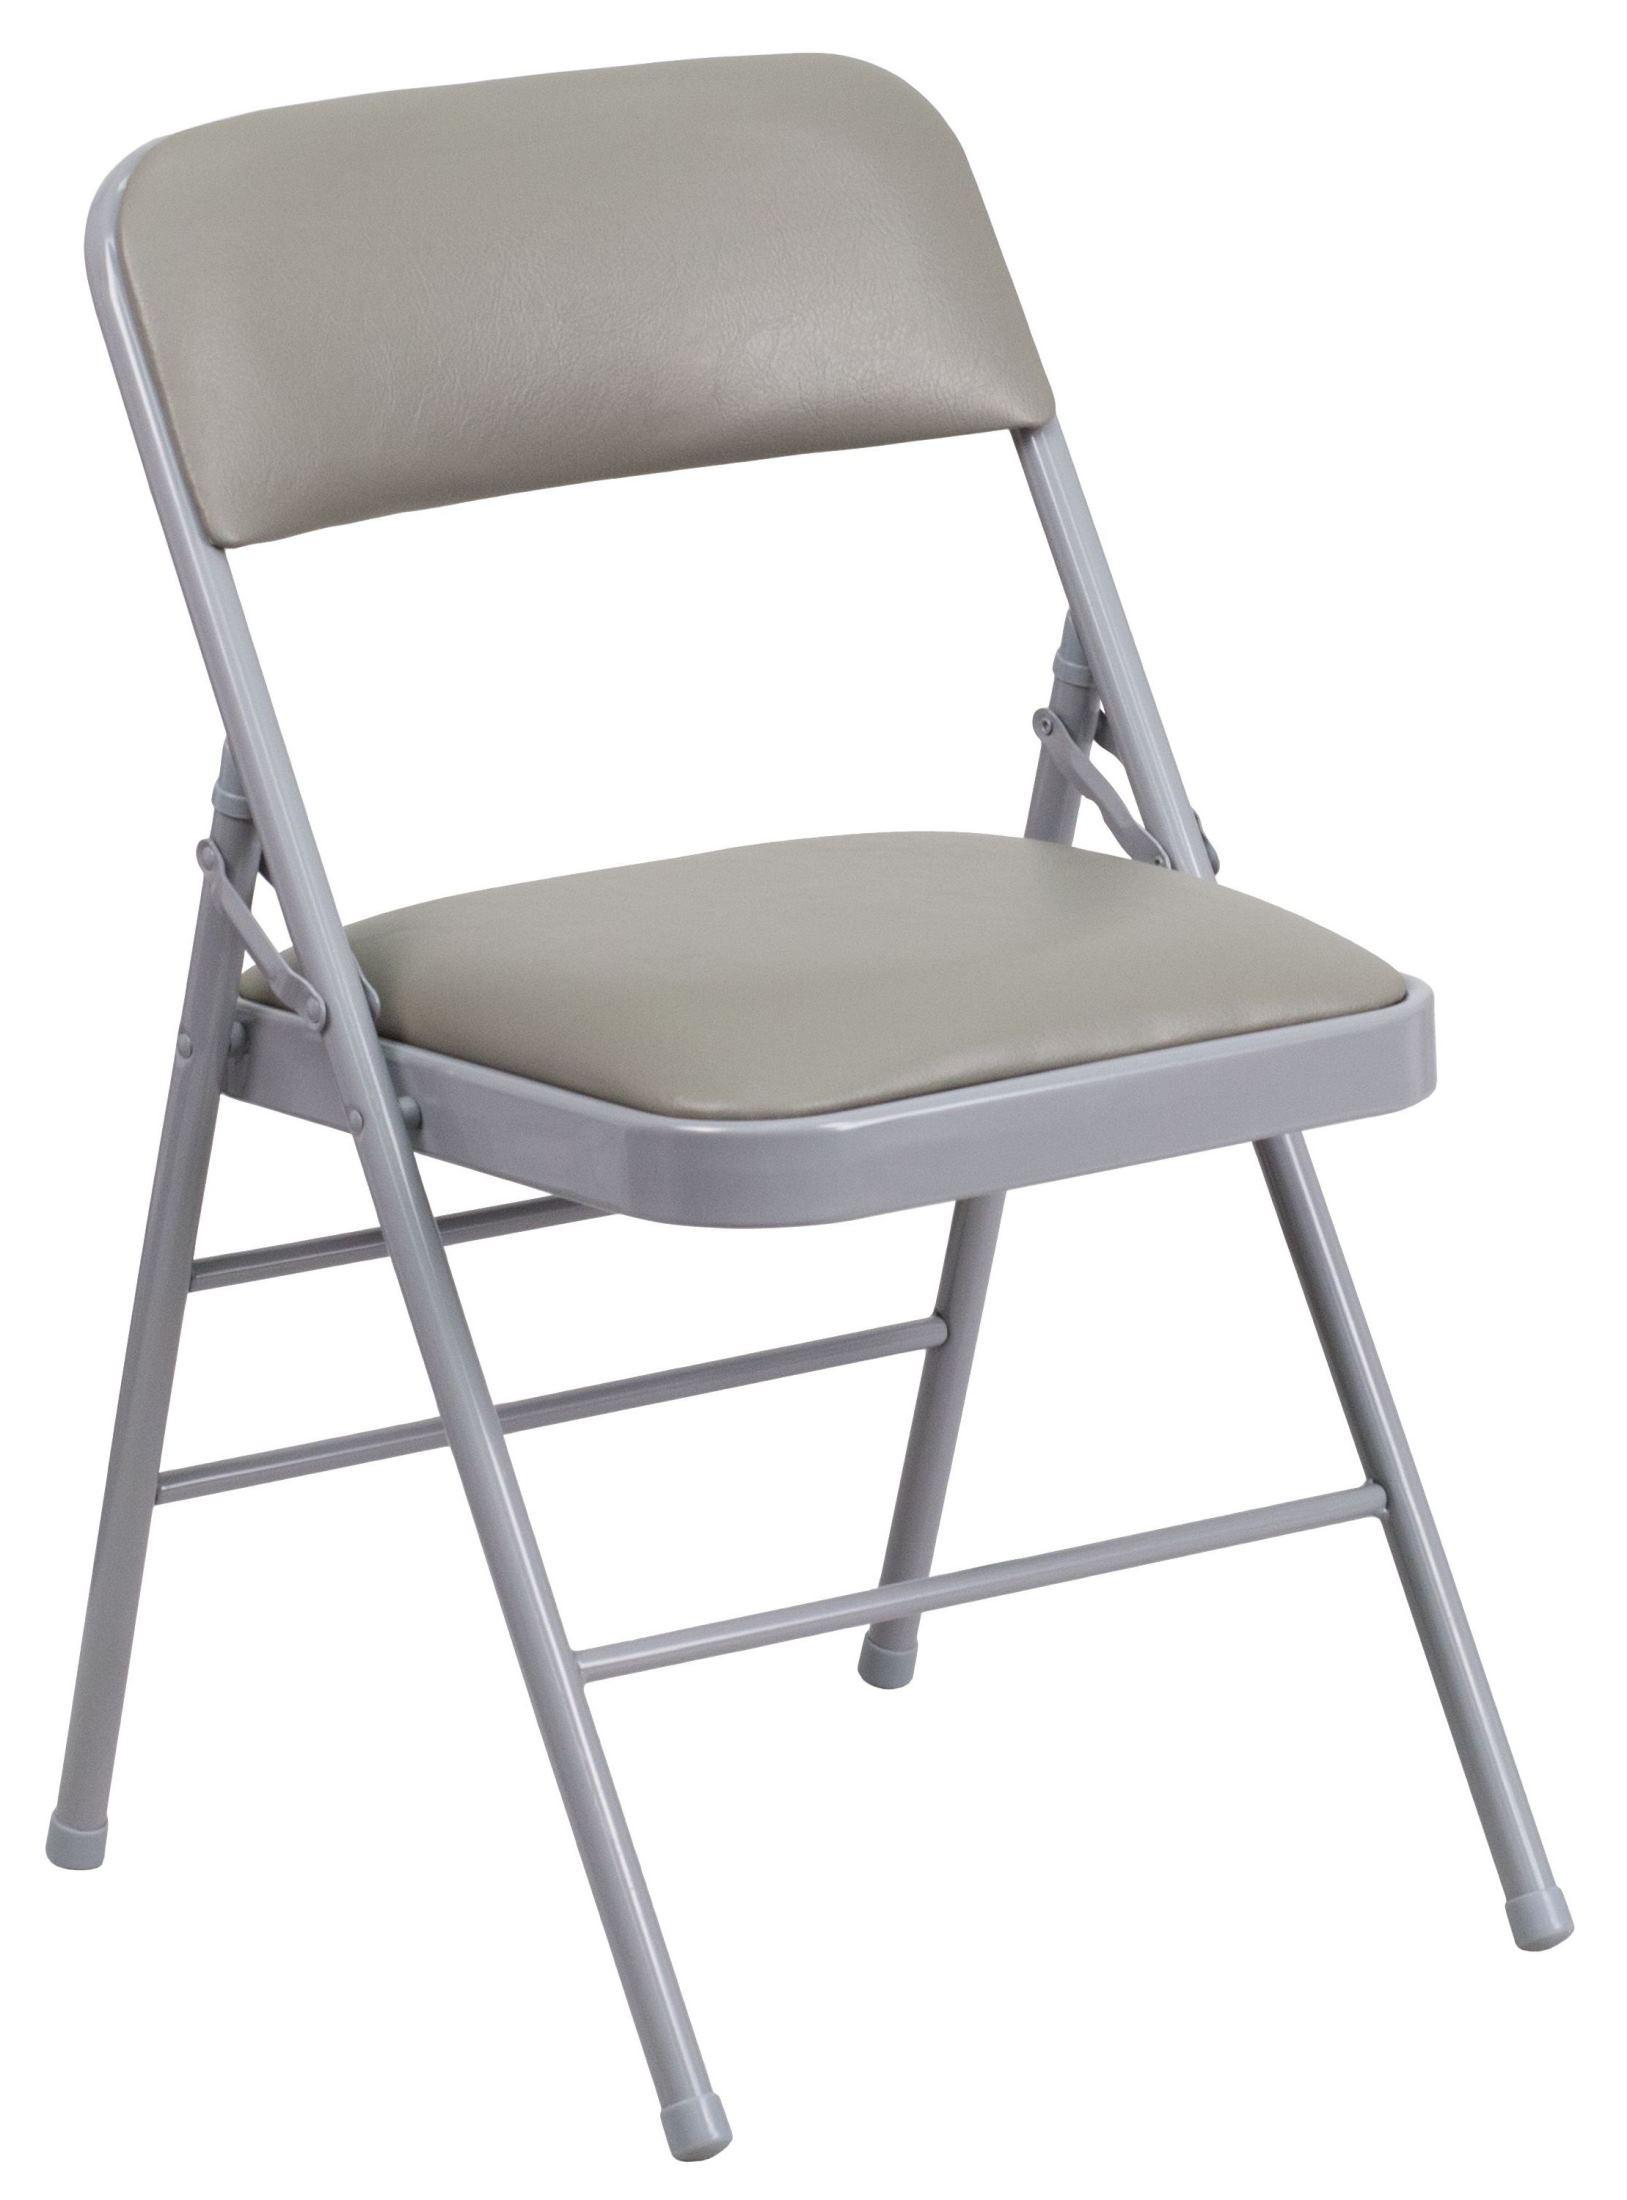 hercules folding chair mid century modern wire series triple braced gray vinyl metal